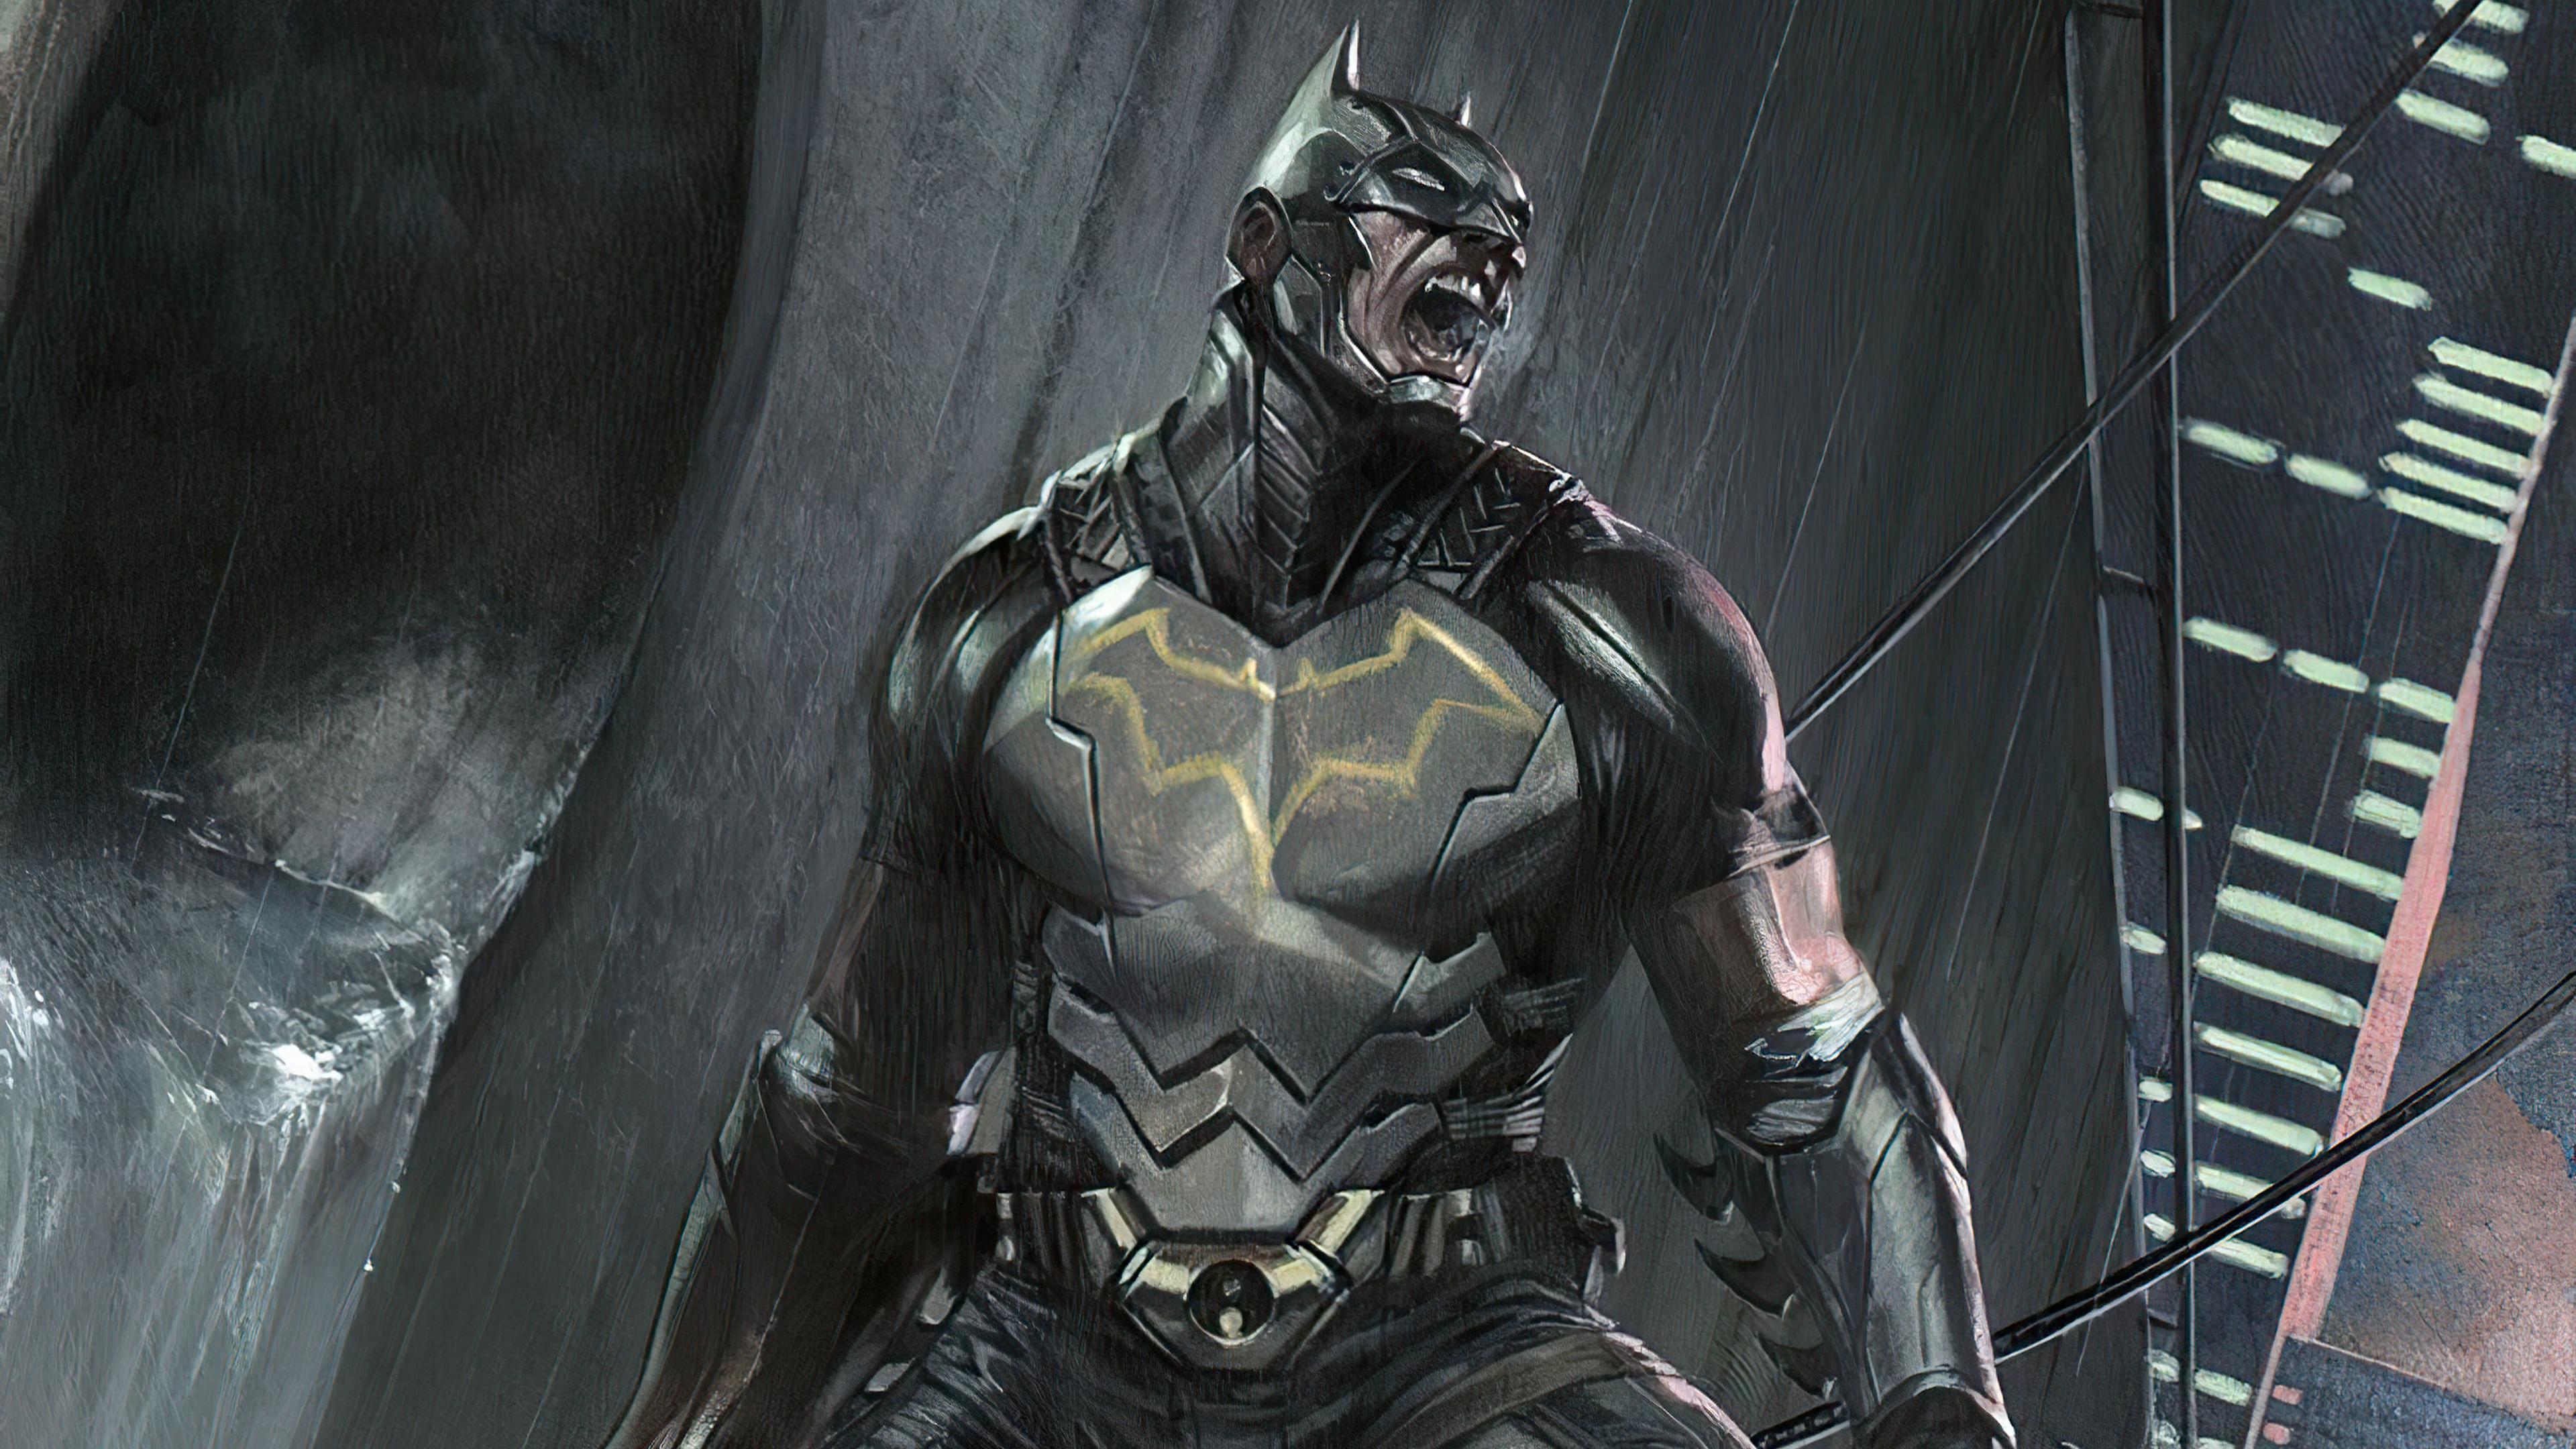 batman future state dark detective 4k 1619216532 - Batman Future State Dark Detective 4k - Batman Future State Dark Detective 4k wallpapers